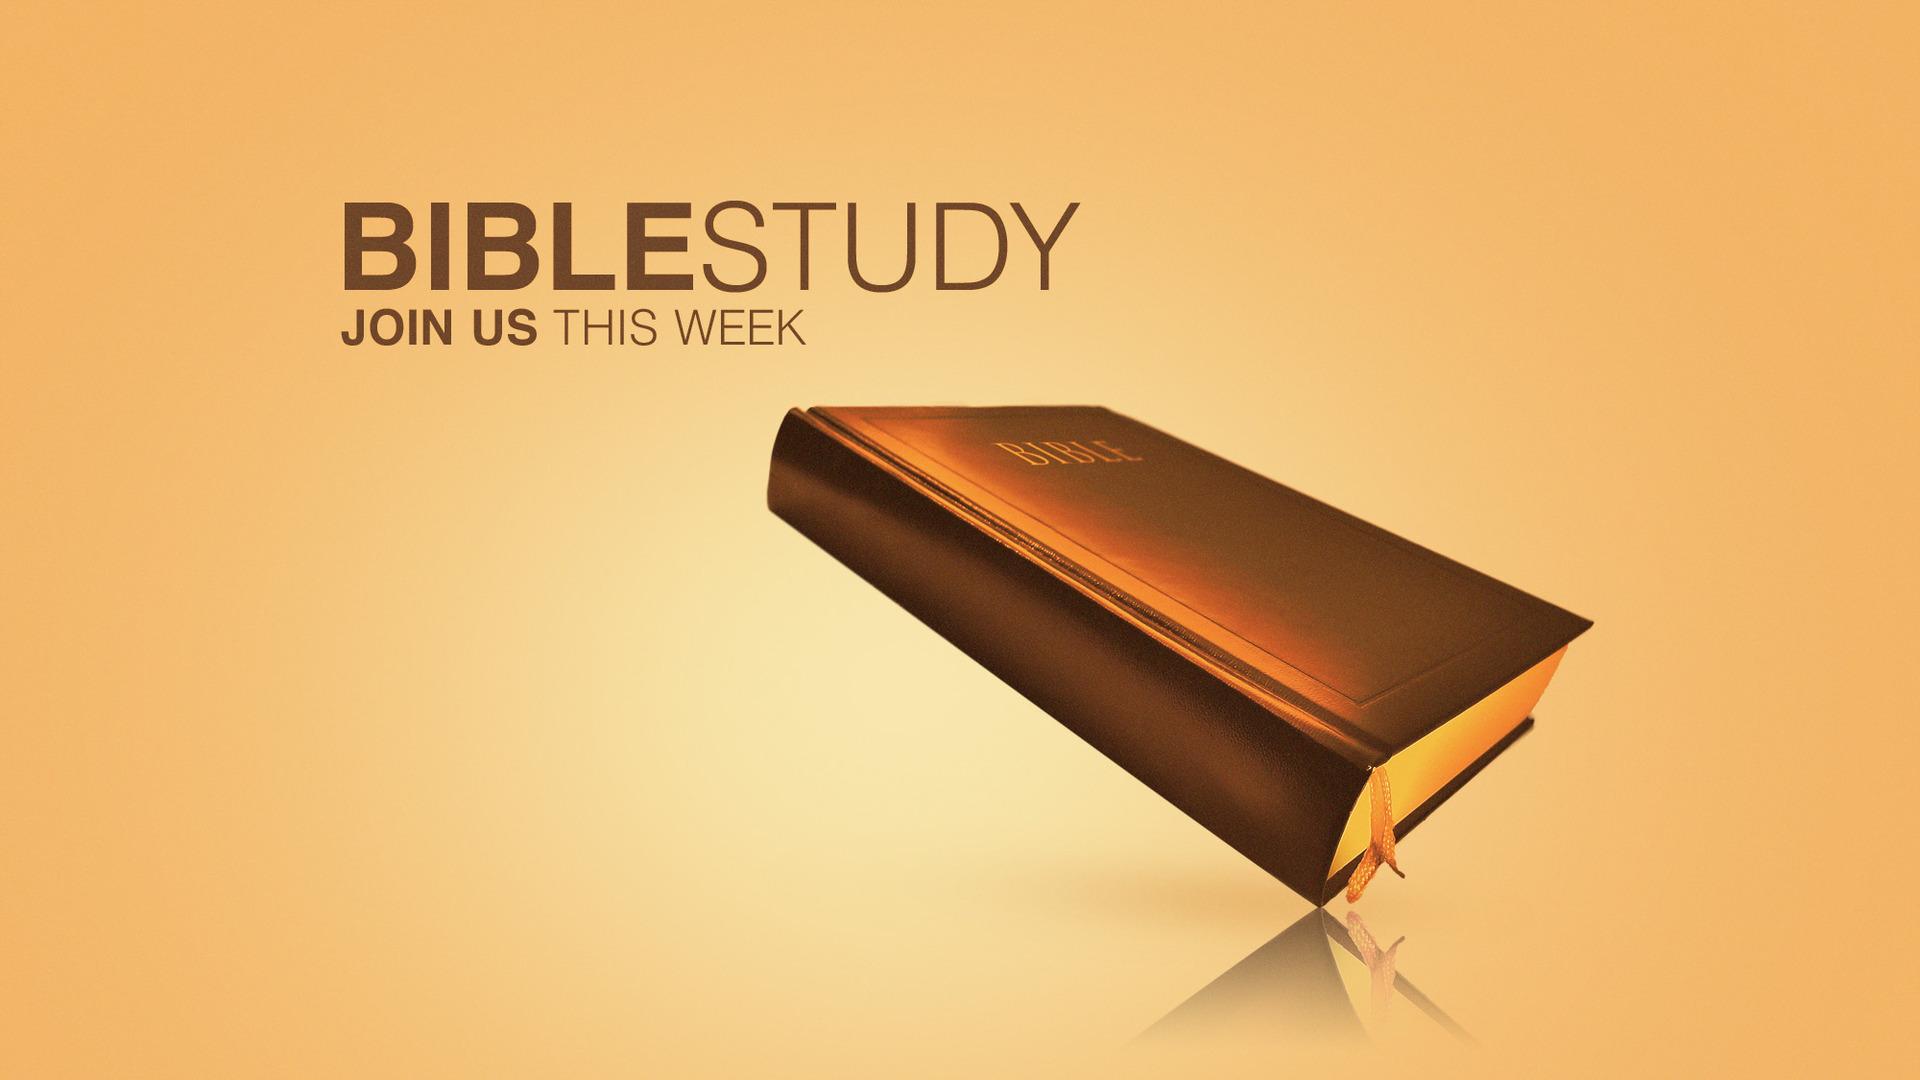 bible_study-title-1-Wide 16x9.jpg